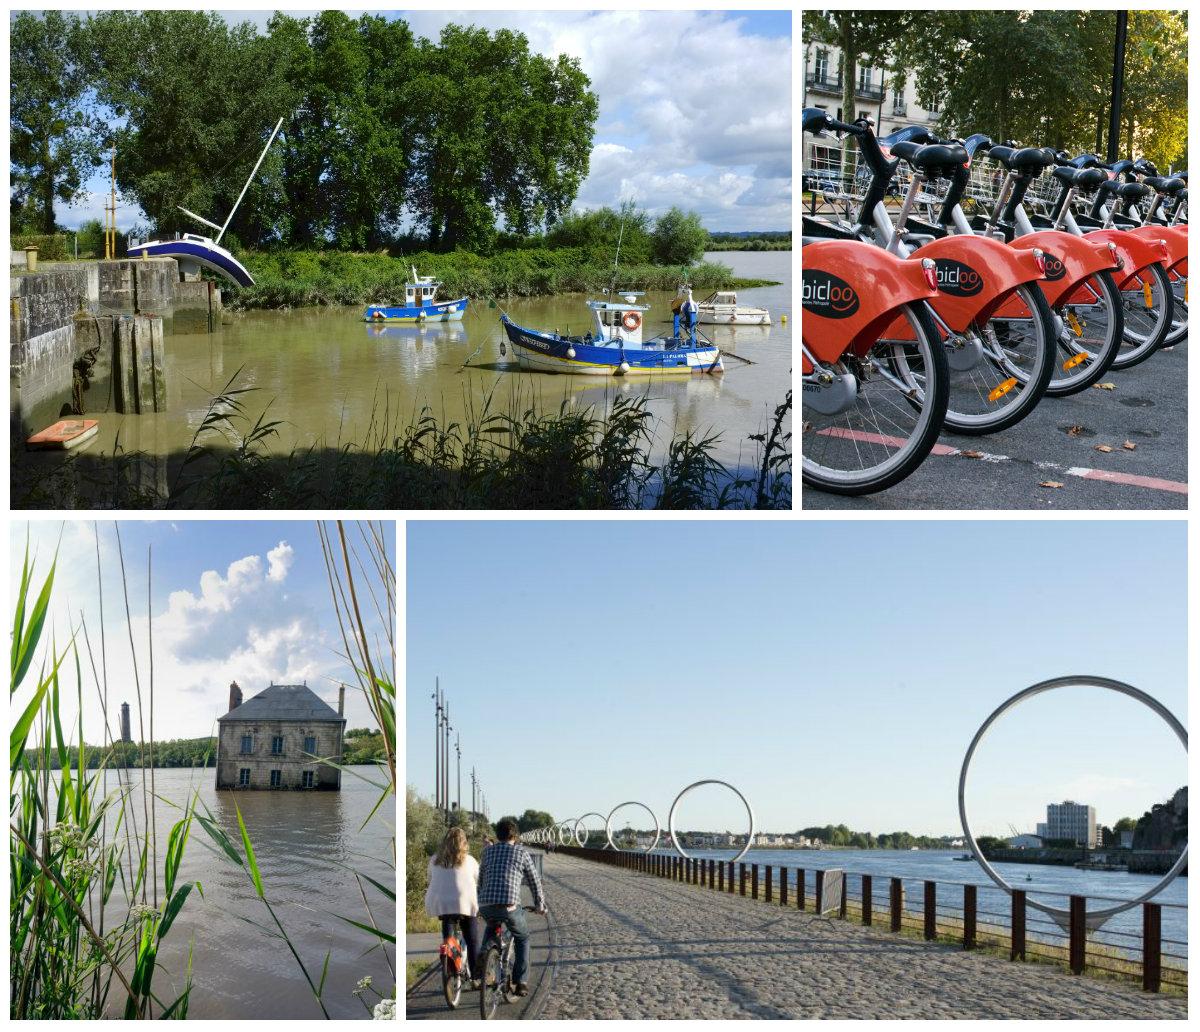 stedentrip Nantes bruisende creatieve stad fietsen langs de Loire